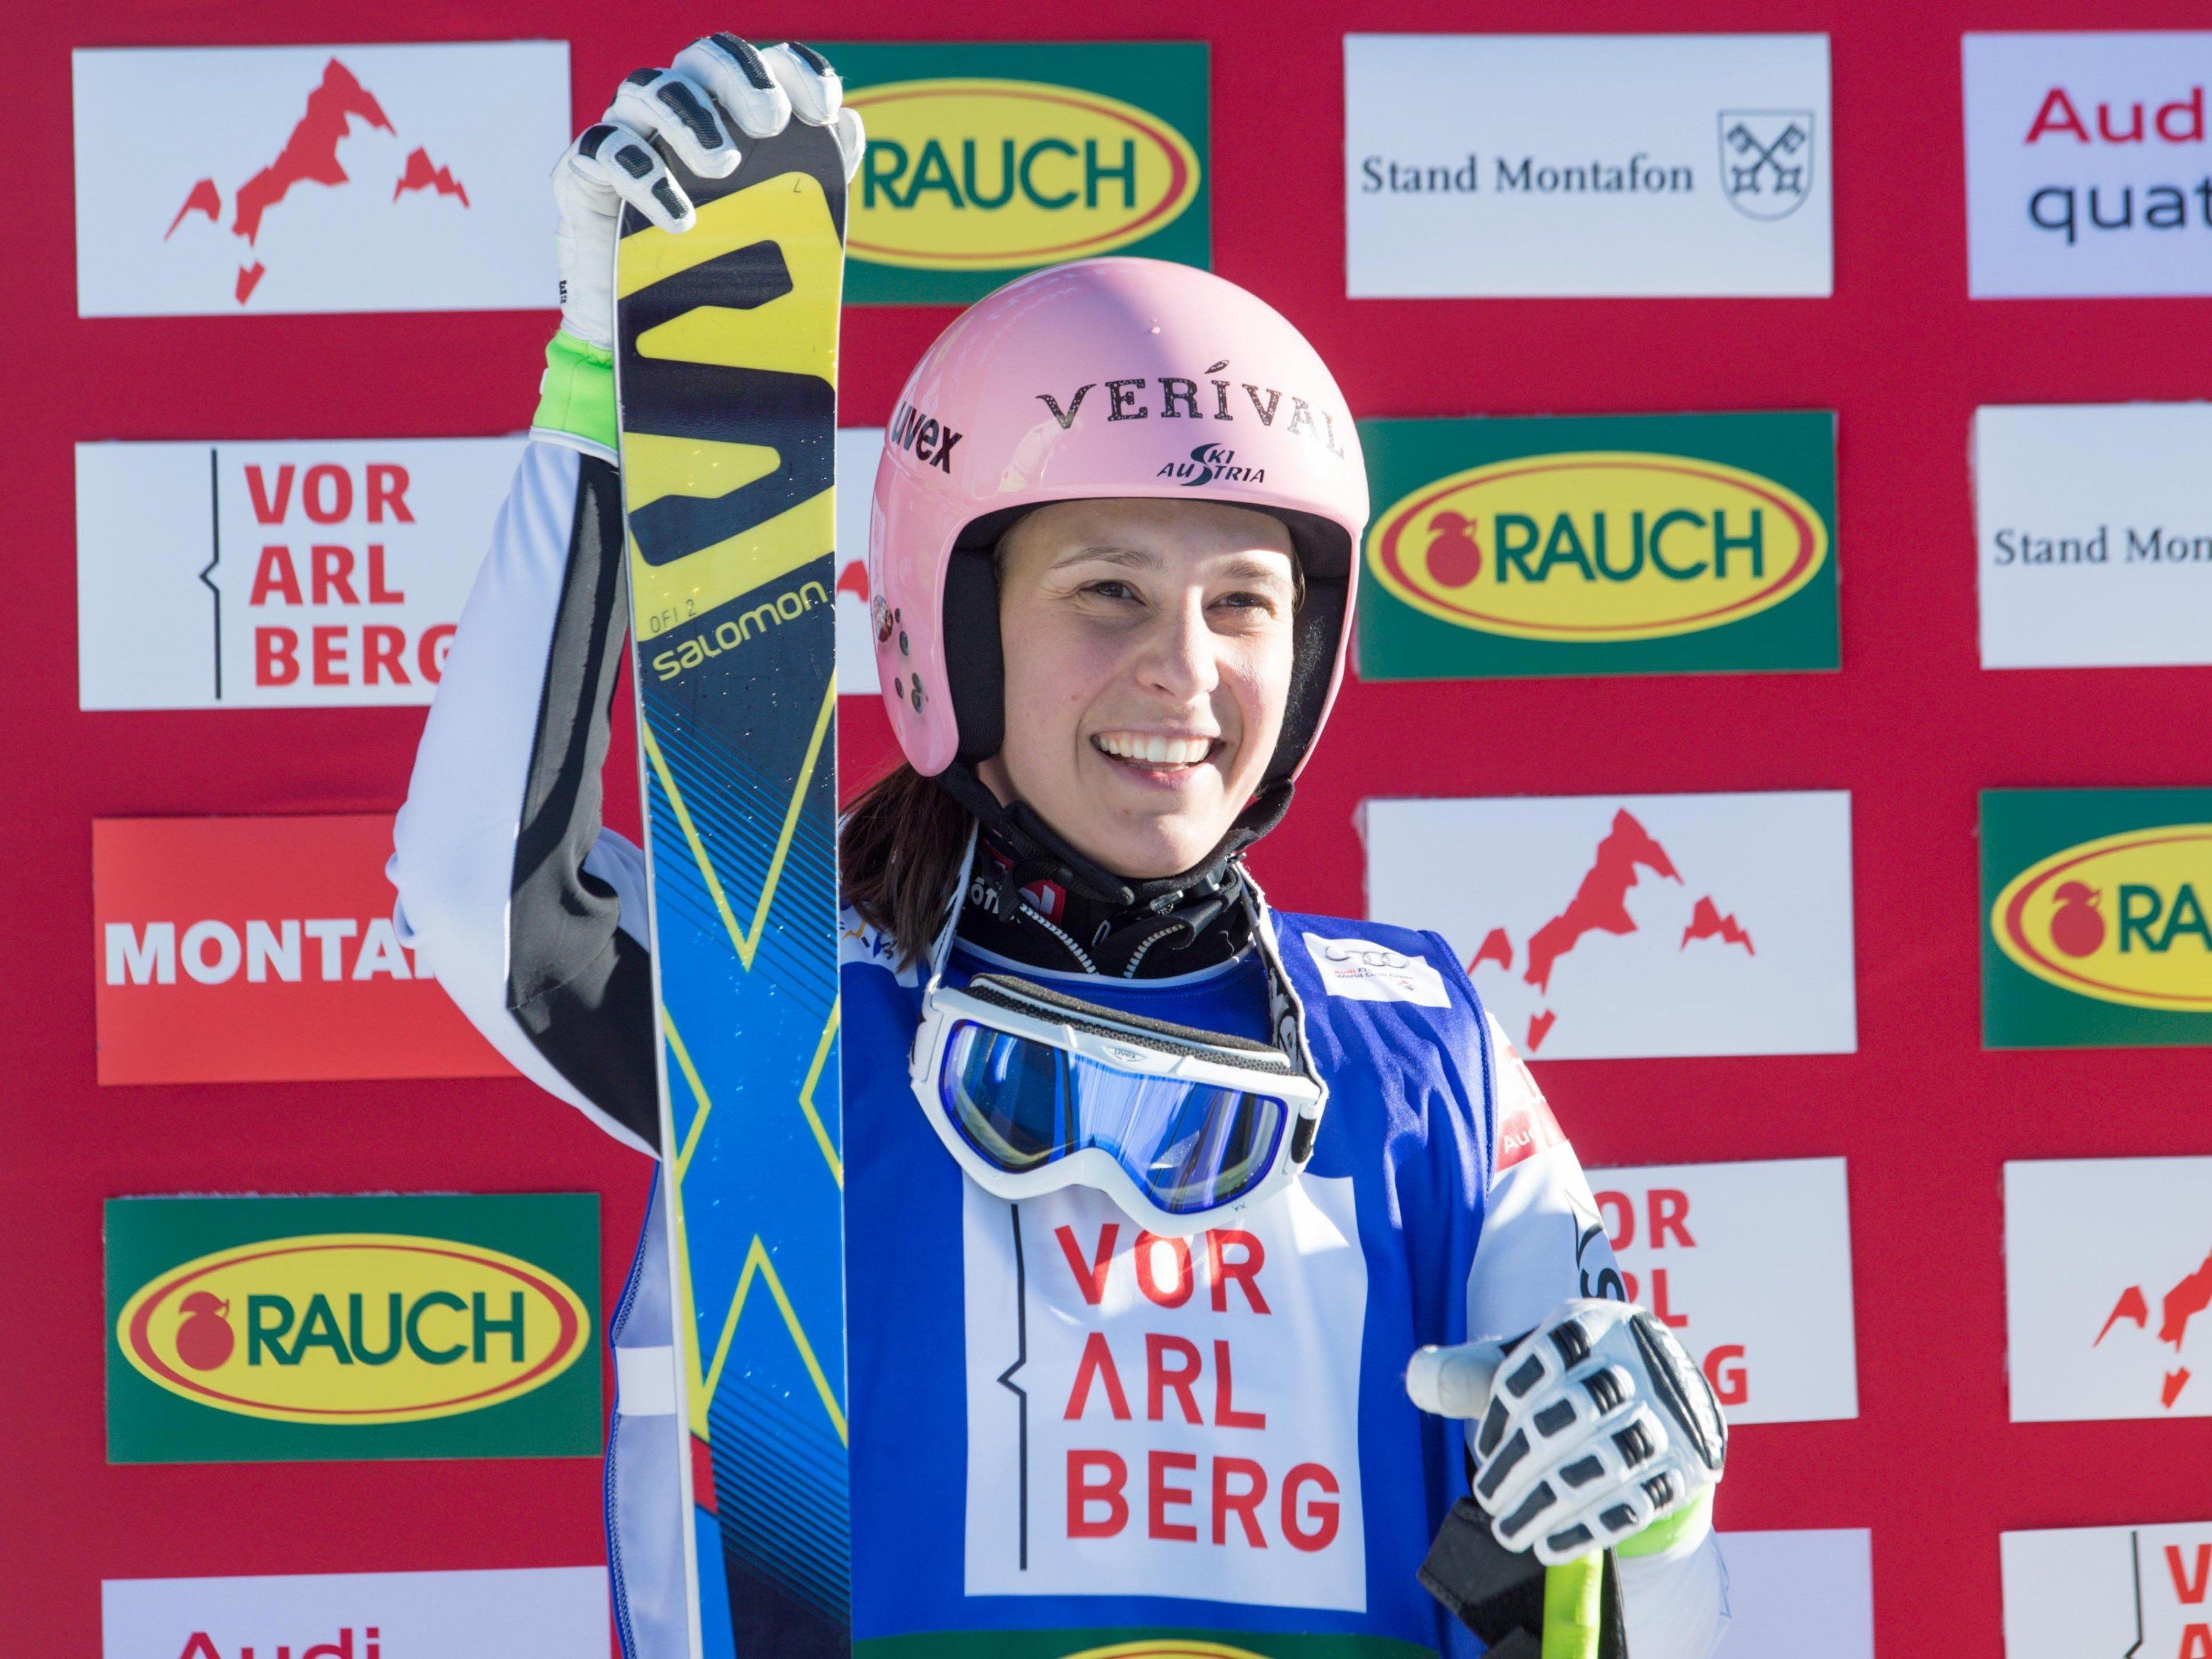 Podestplatz für Ski-Crosserin Katrin Ofner.